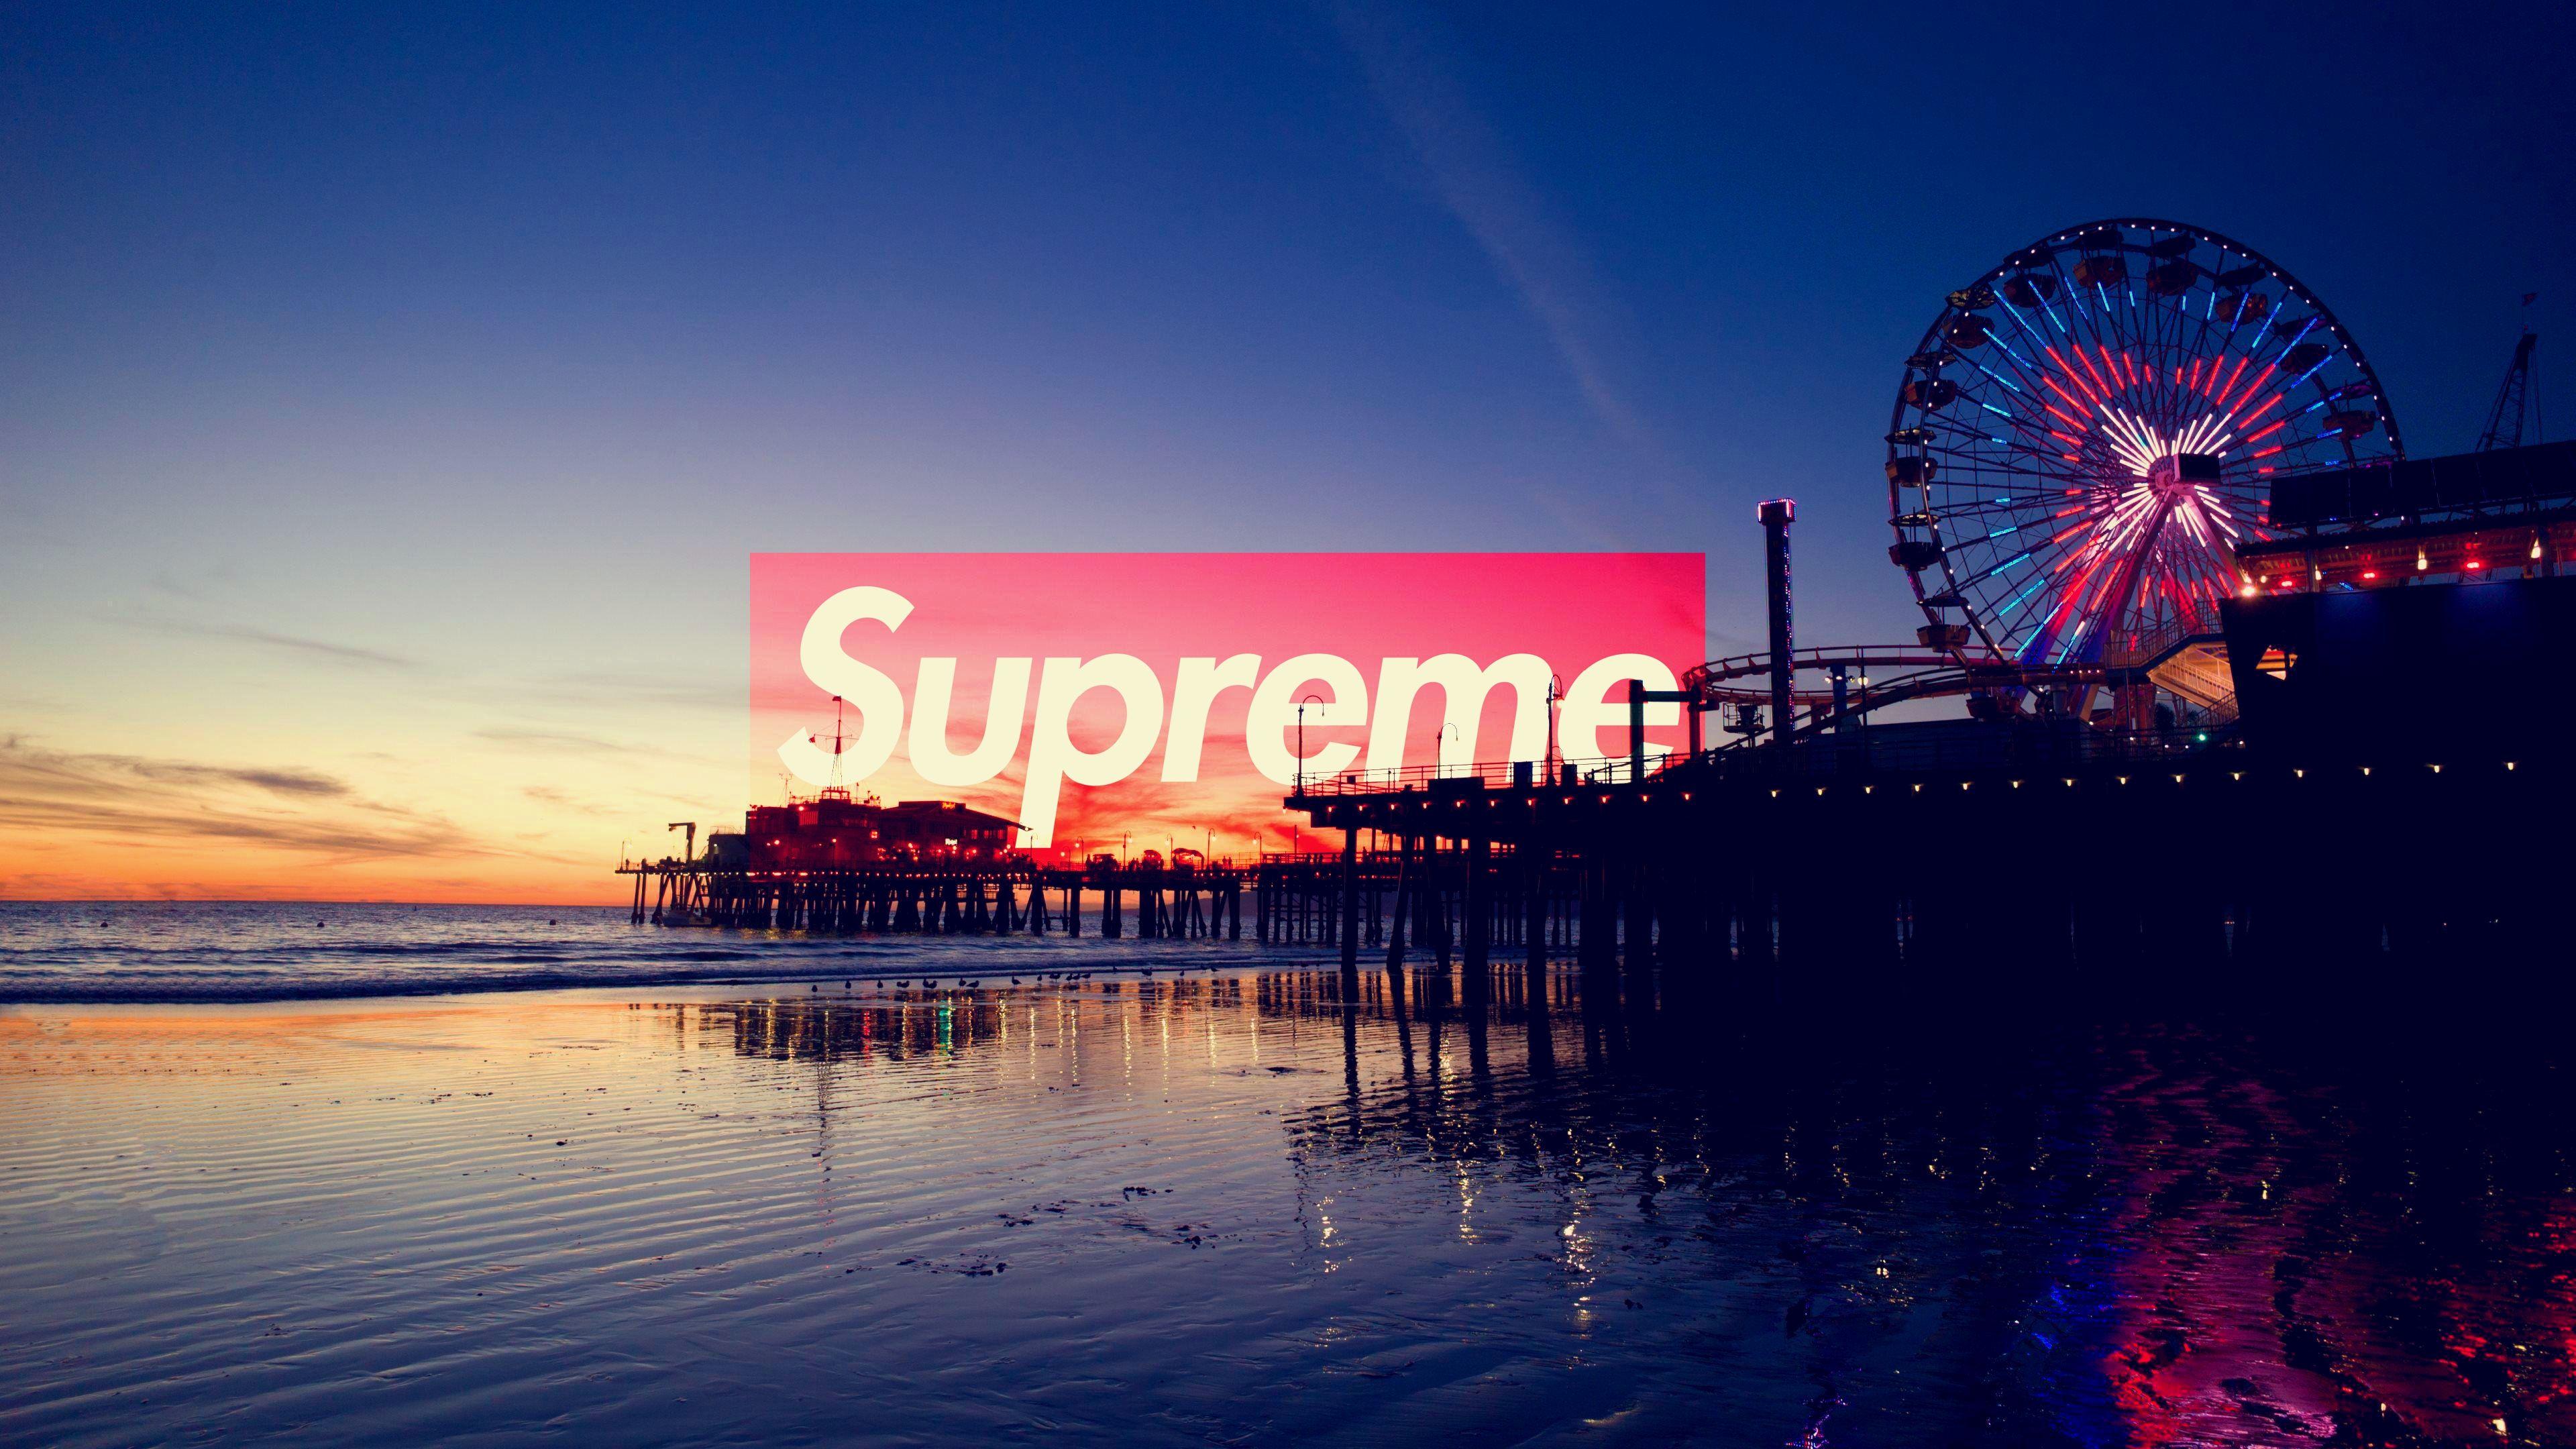 Supreme Los Angeles SUPREME Laptop wallpaper Supreme 3840x2160